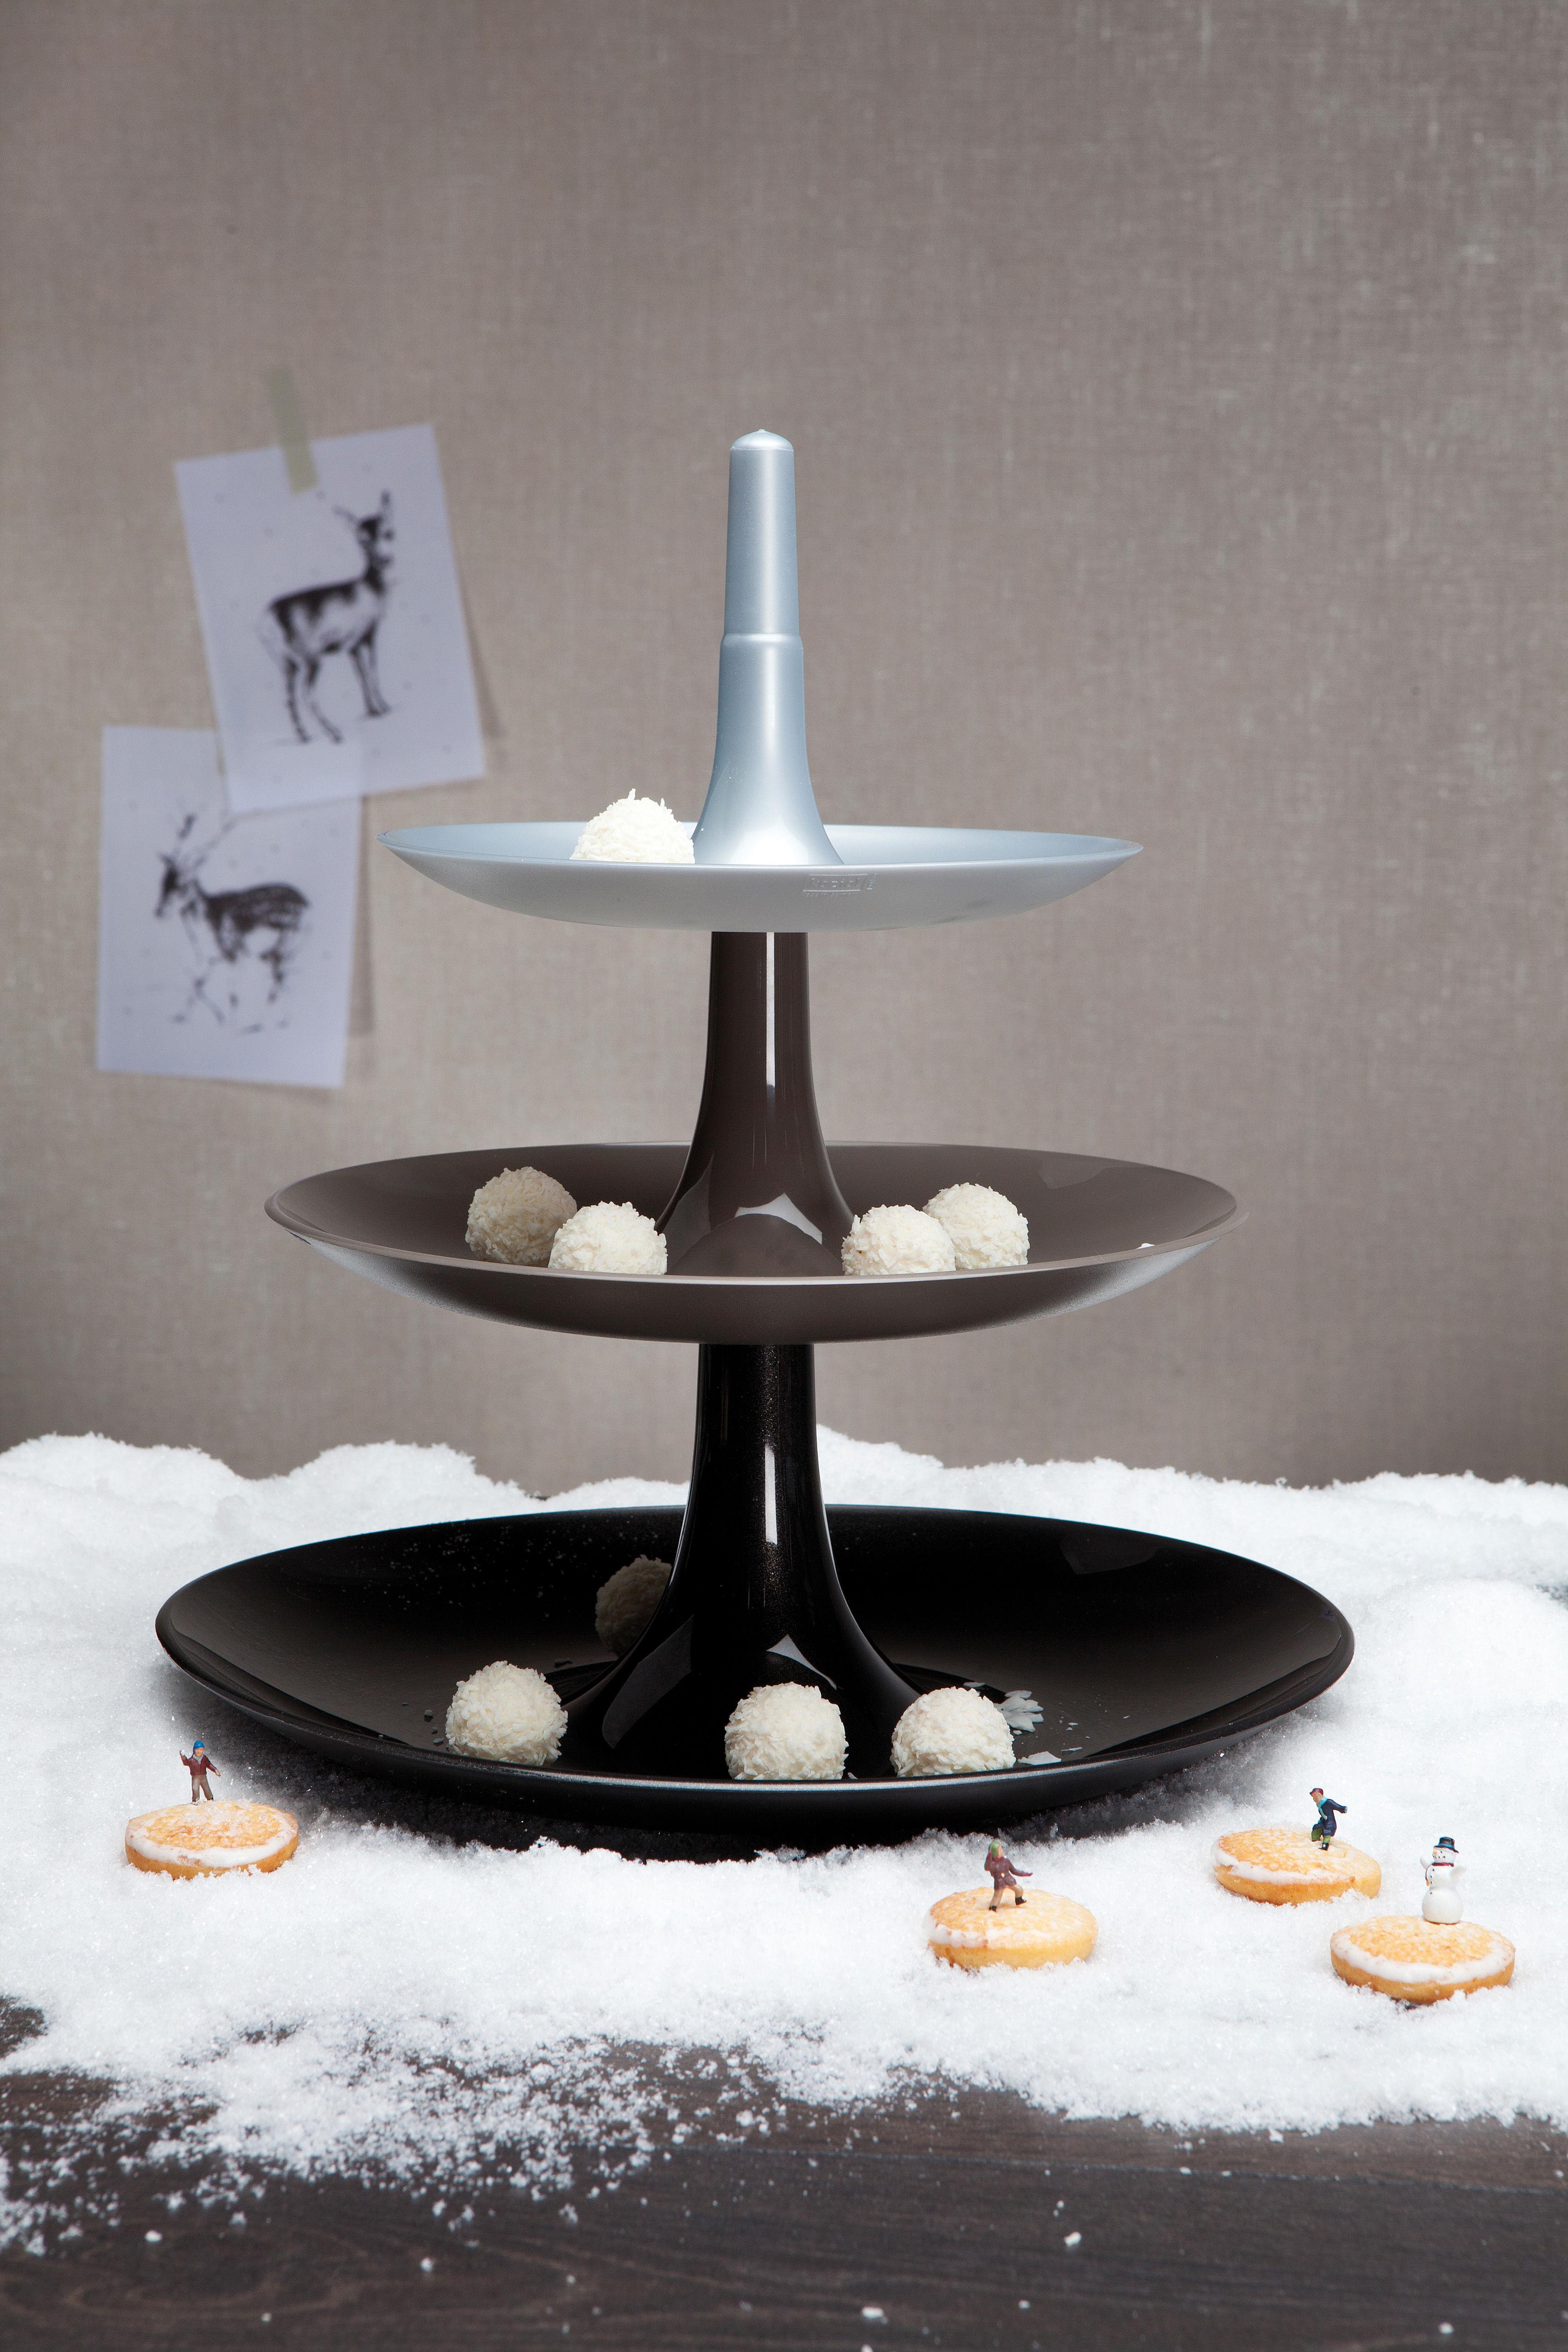 porte fruits babell 31 4 x h 34 cm argent opaque koziol. Black Bedroom Furniture Sets. Home Design Ideas